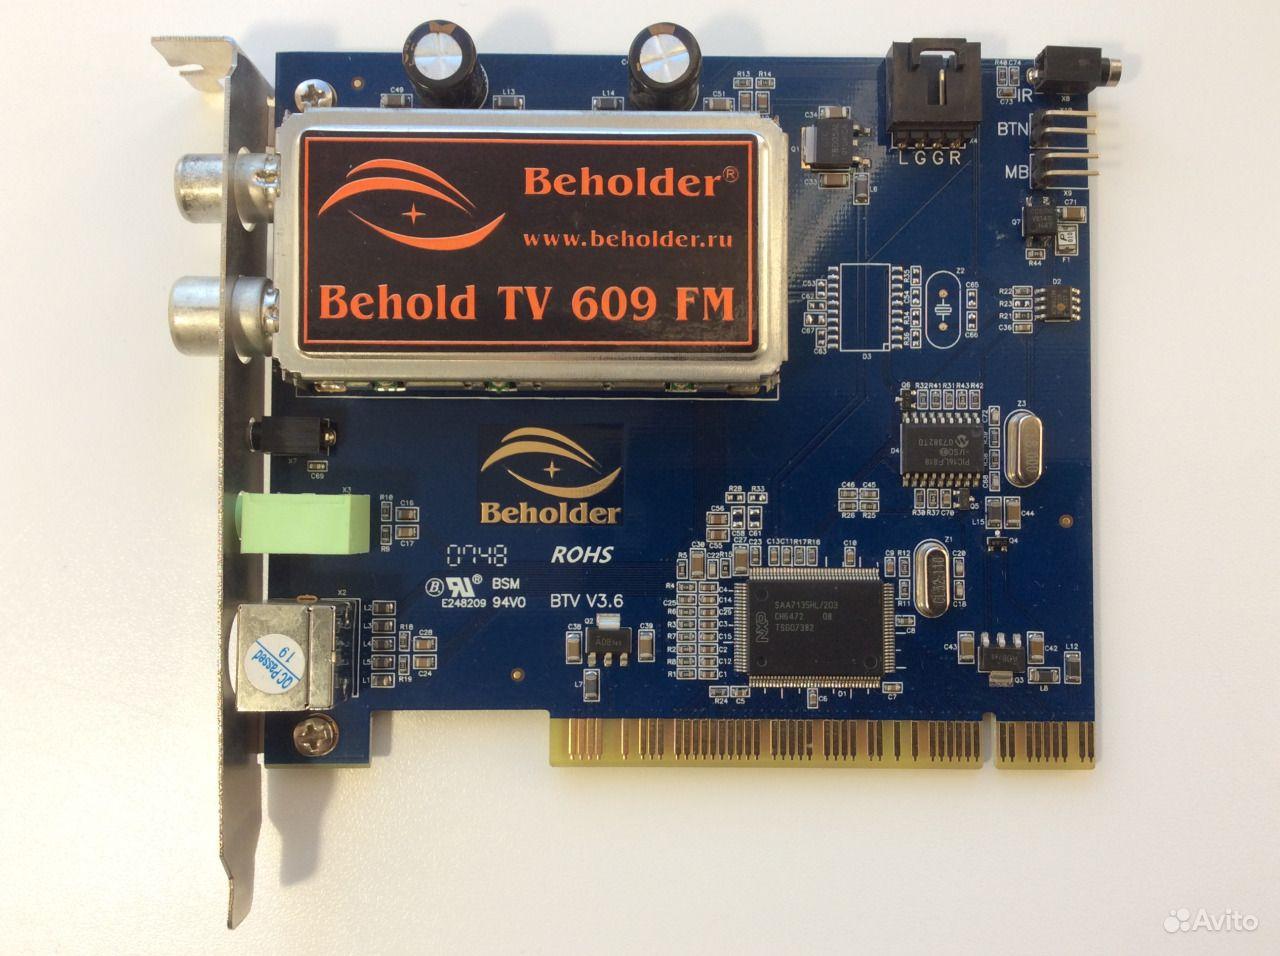 BEHOLD TV 609 FM WINDOWS DRIVER DOWNLOAD